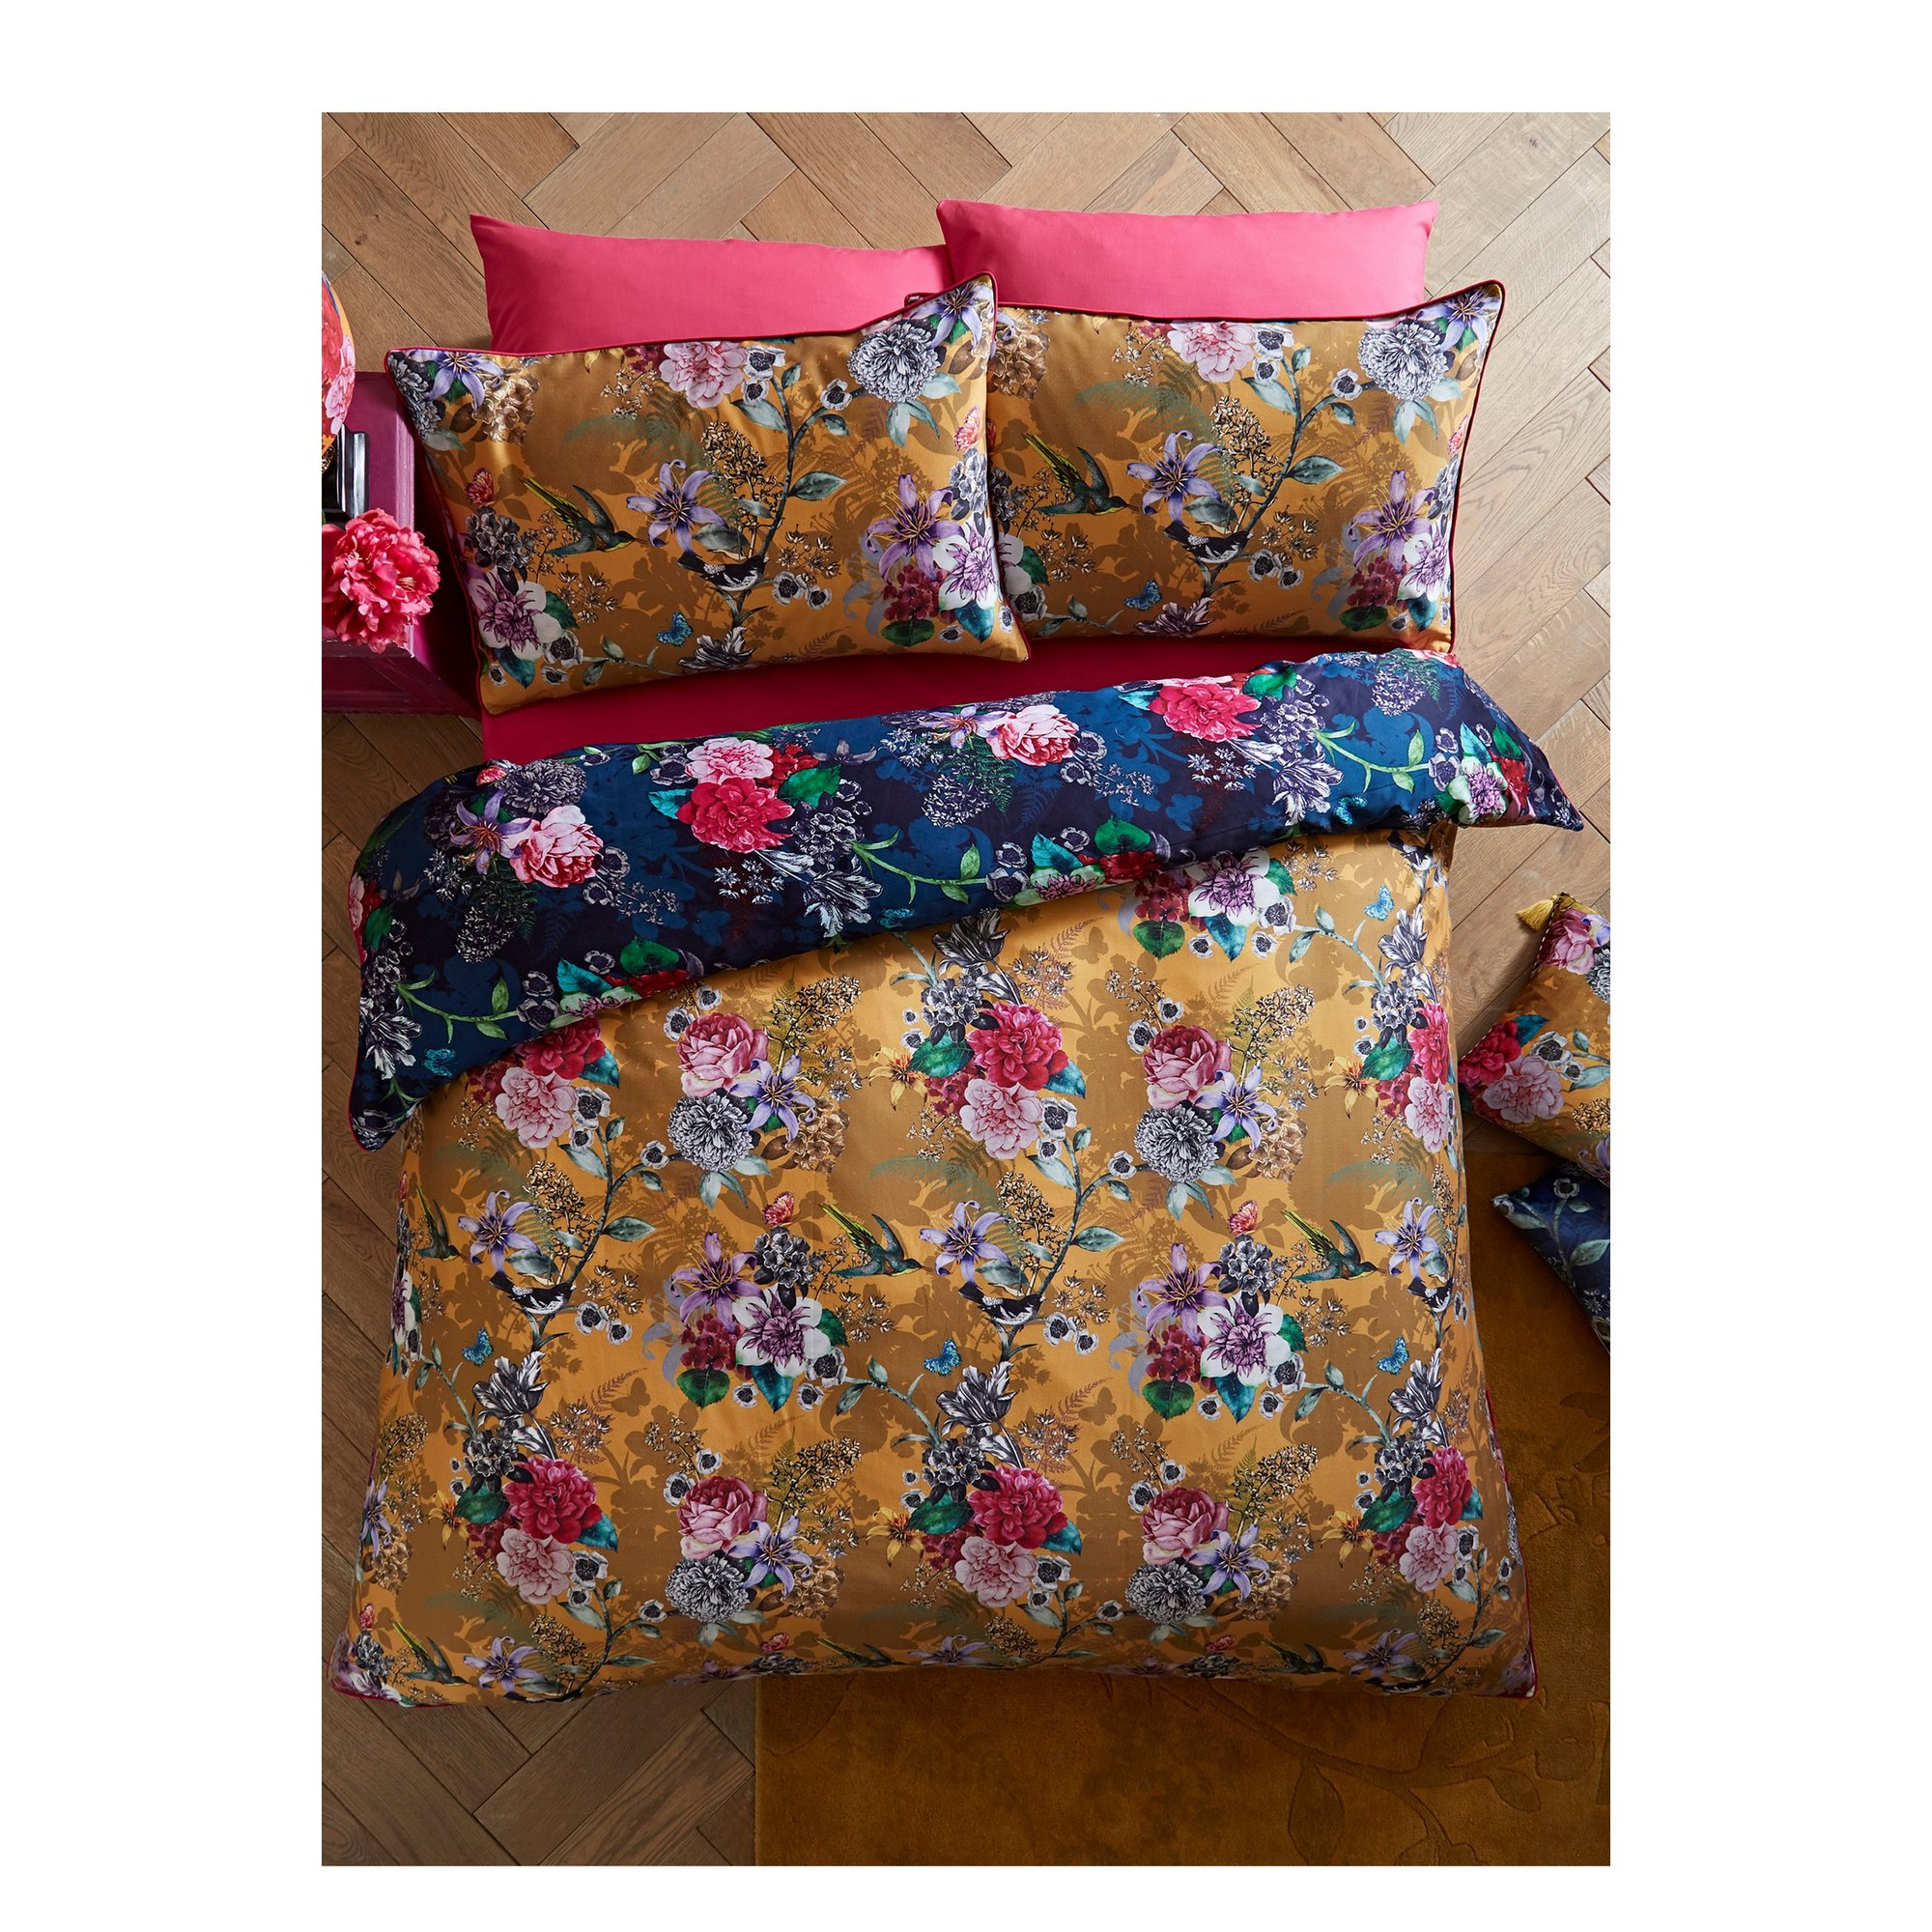 Image of Flowerful Reversible Duvet Set